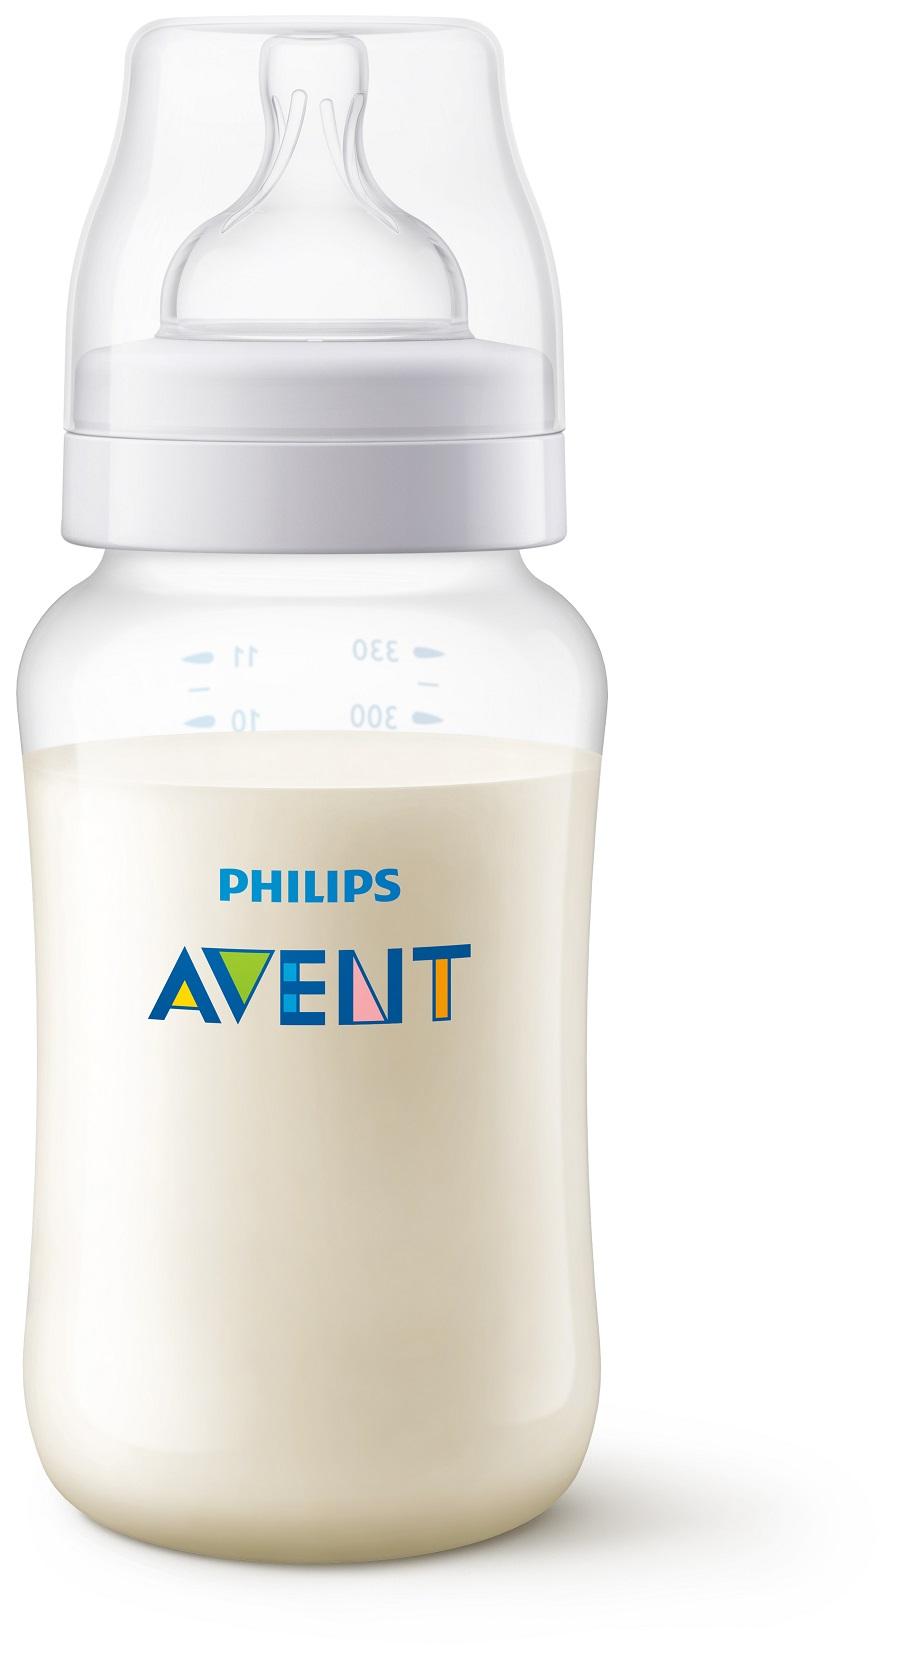 PHILIPS AVENT Láhev Anti-colic 1 ks 330 ml